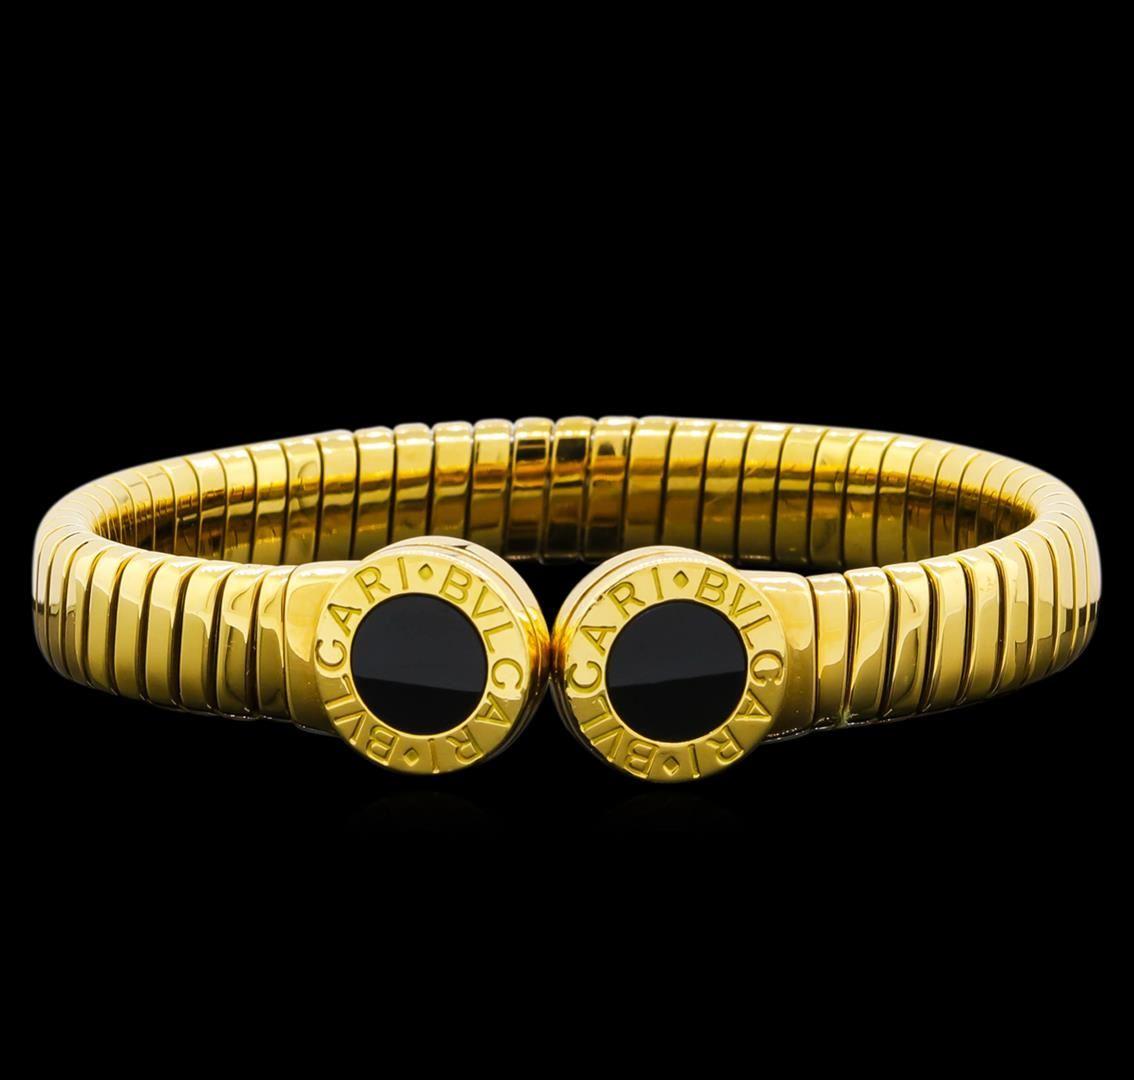 68de46a8e4cc0 Image 1 : Bvlgari 18KT Yellow Gold Cuff Bracelet ...